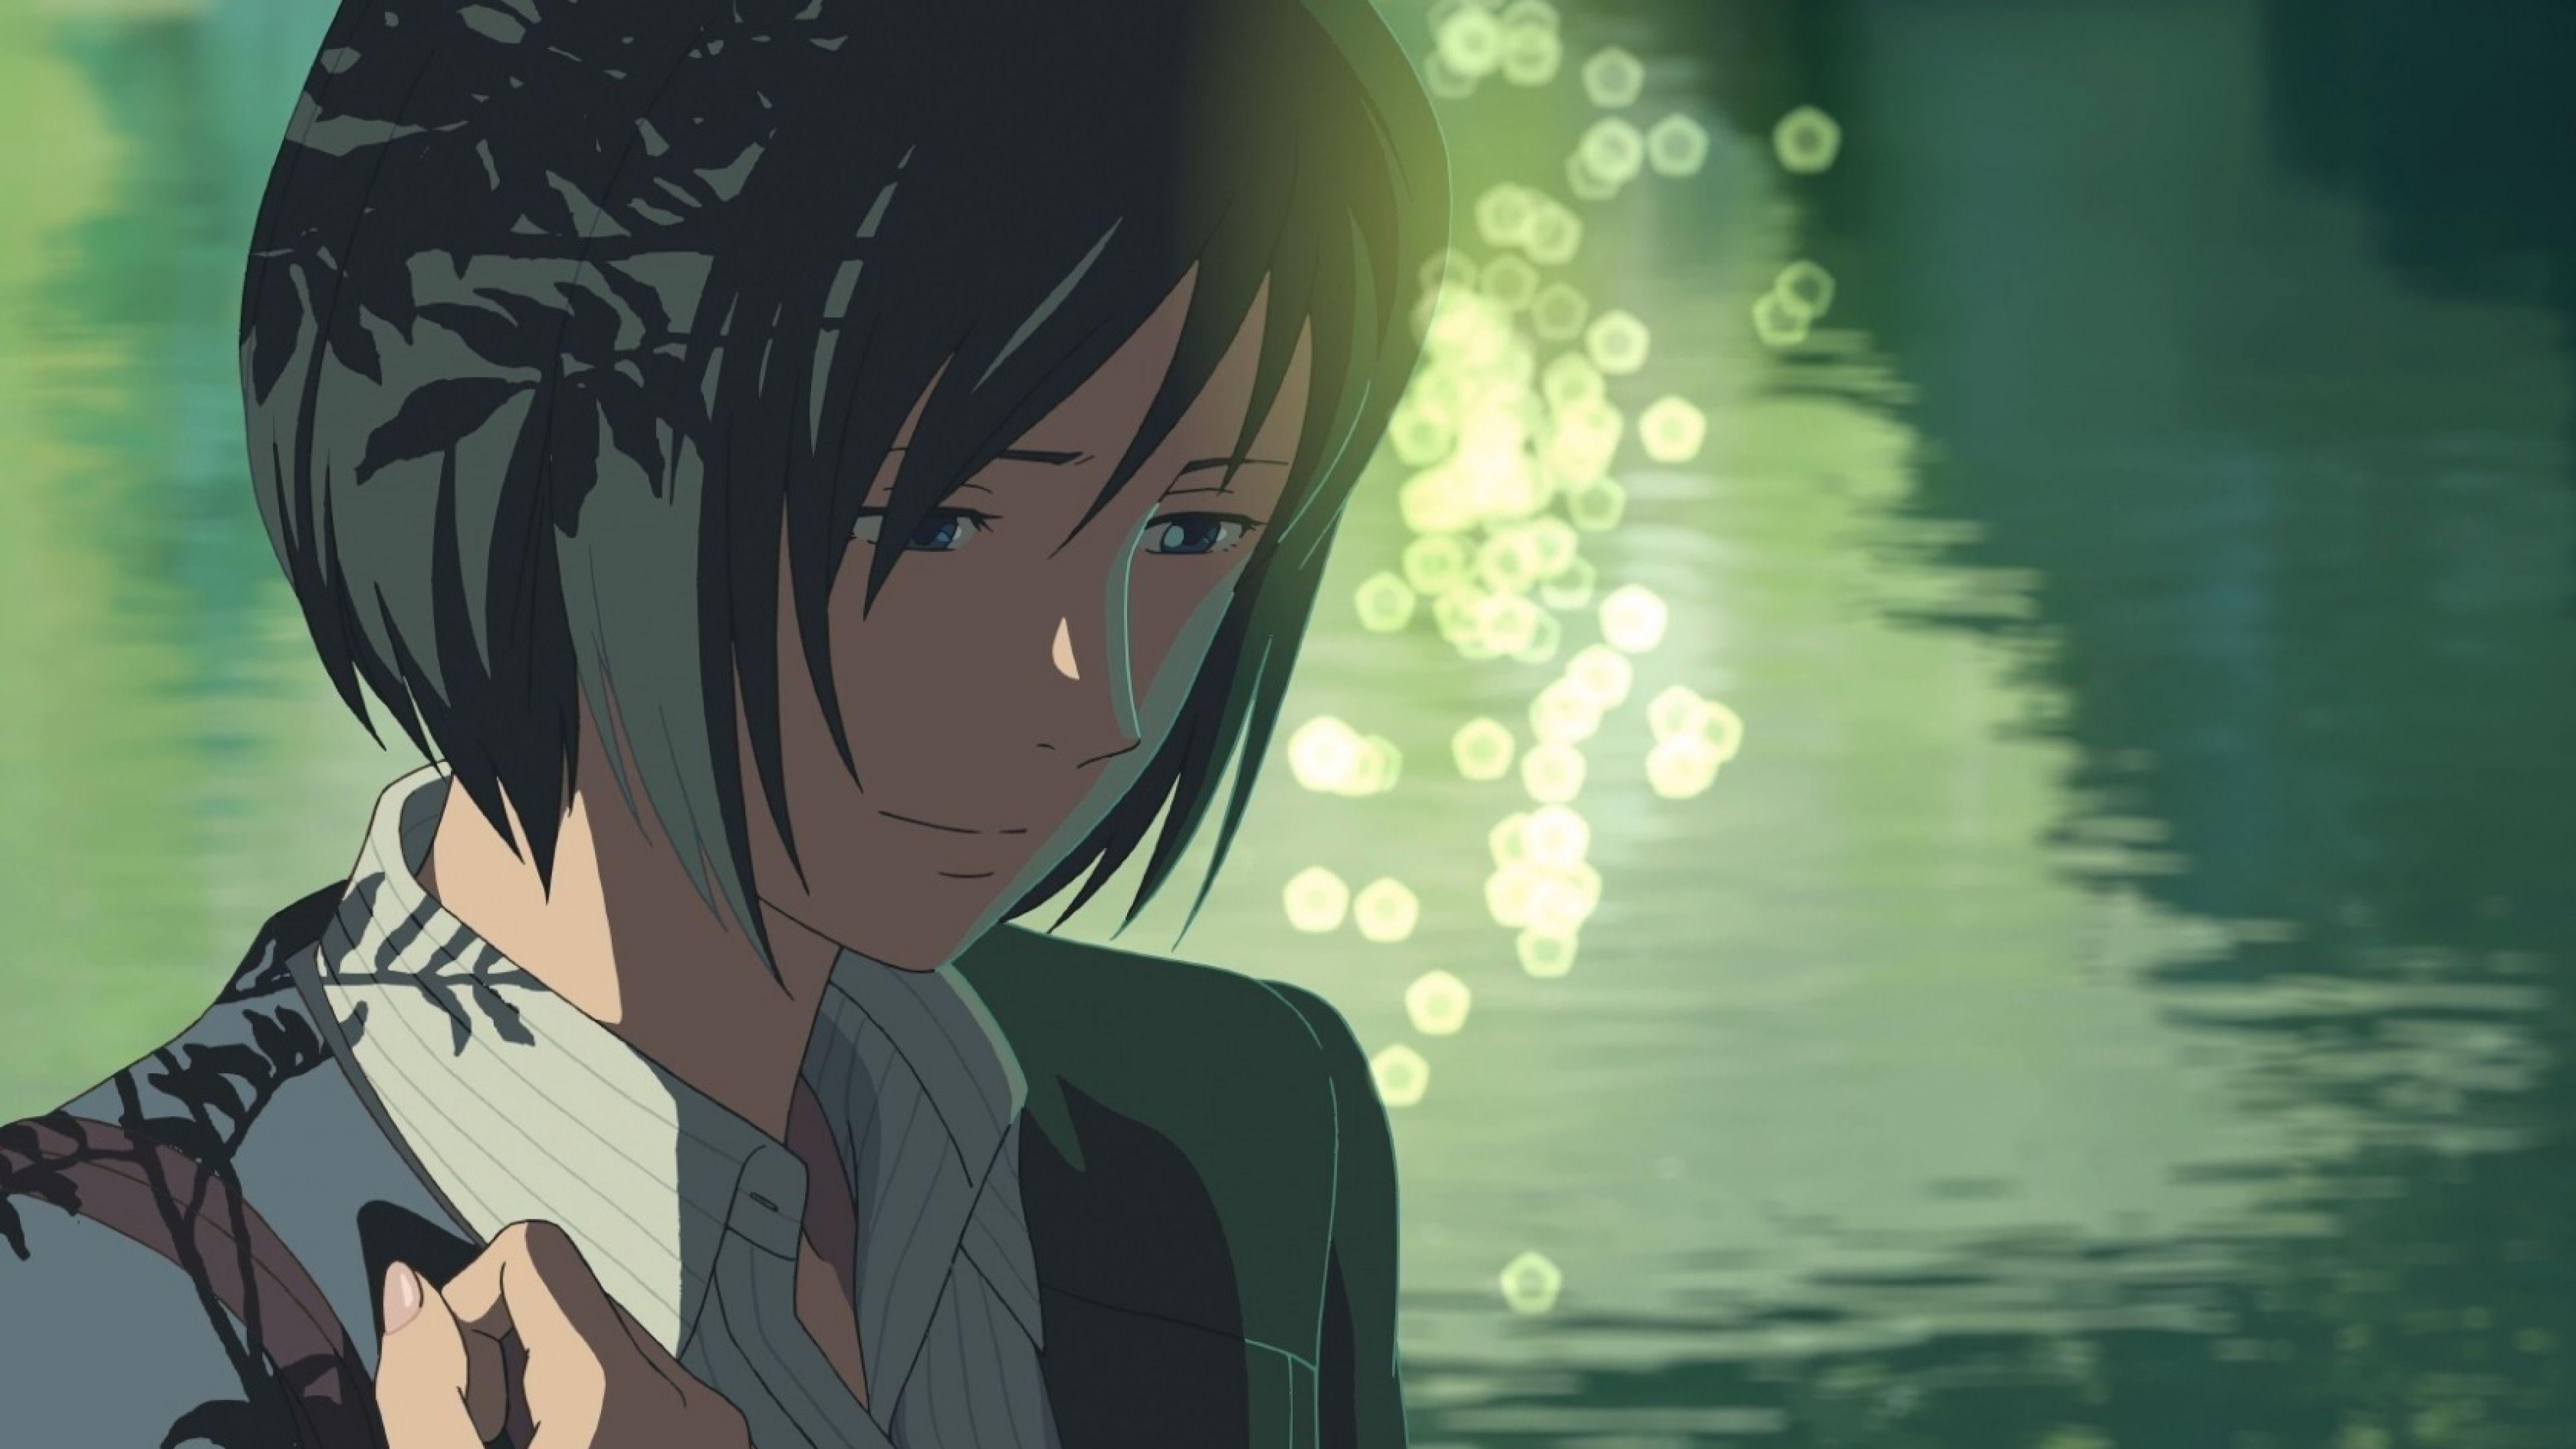 4k Lo Fi Wallpapers Top Free 4k Lo Fi Backgrounds Wallpaperaccess Anime Animes Manga Papeis De Parede Paisagens